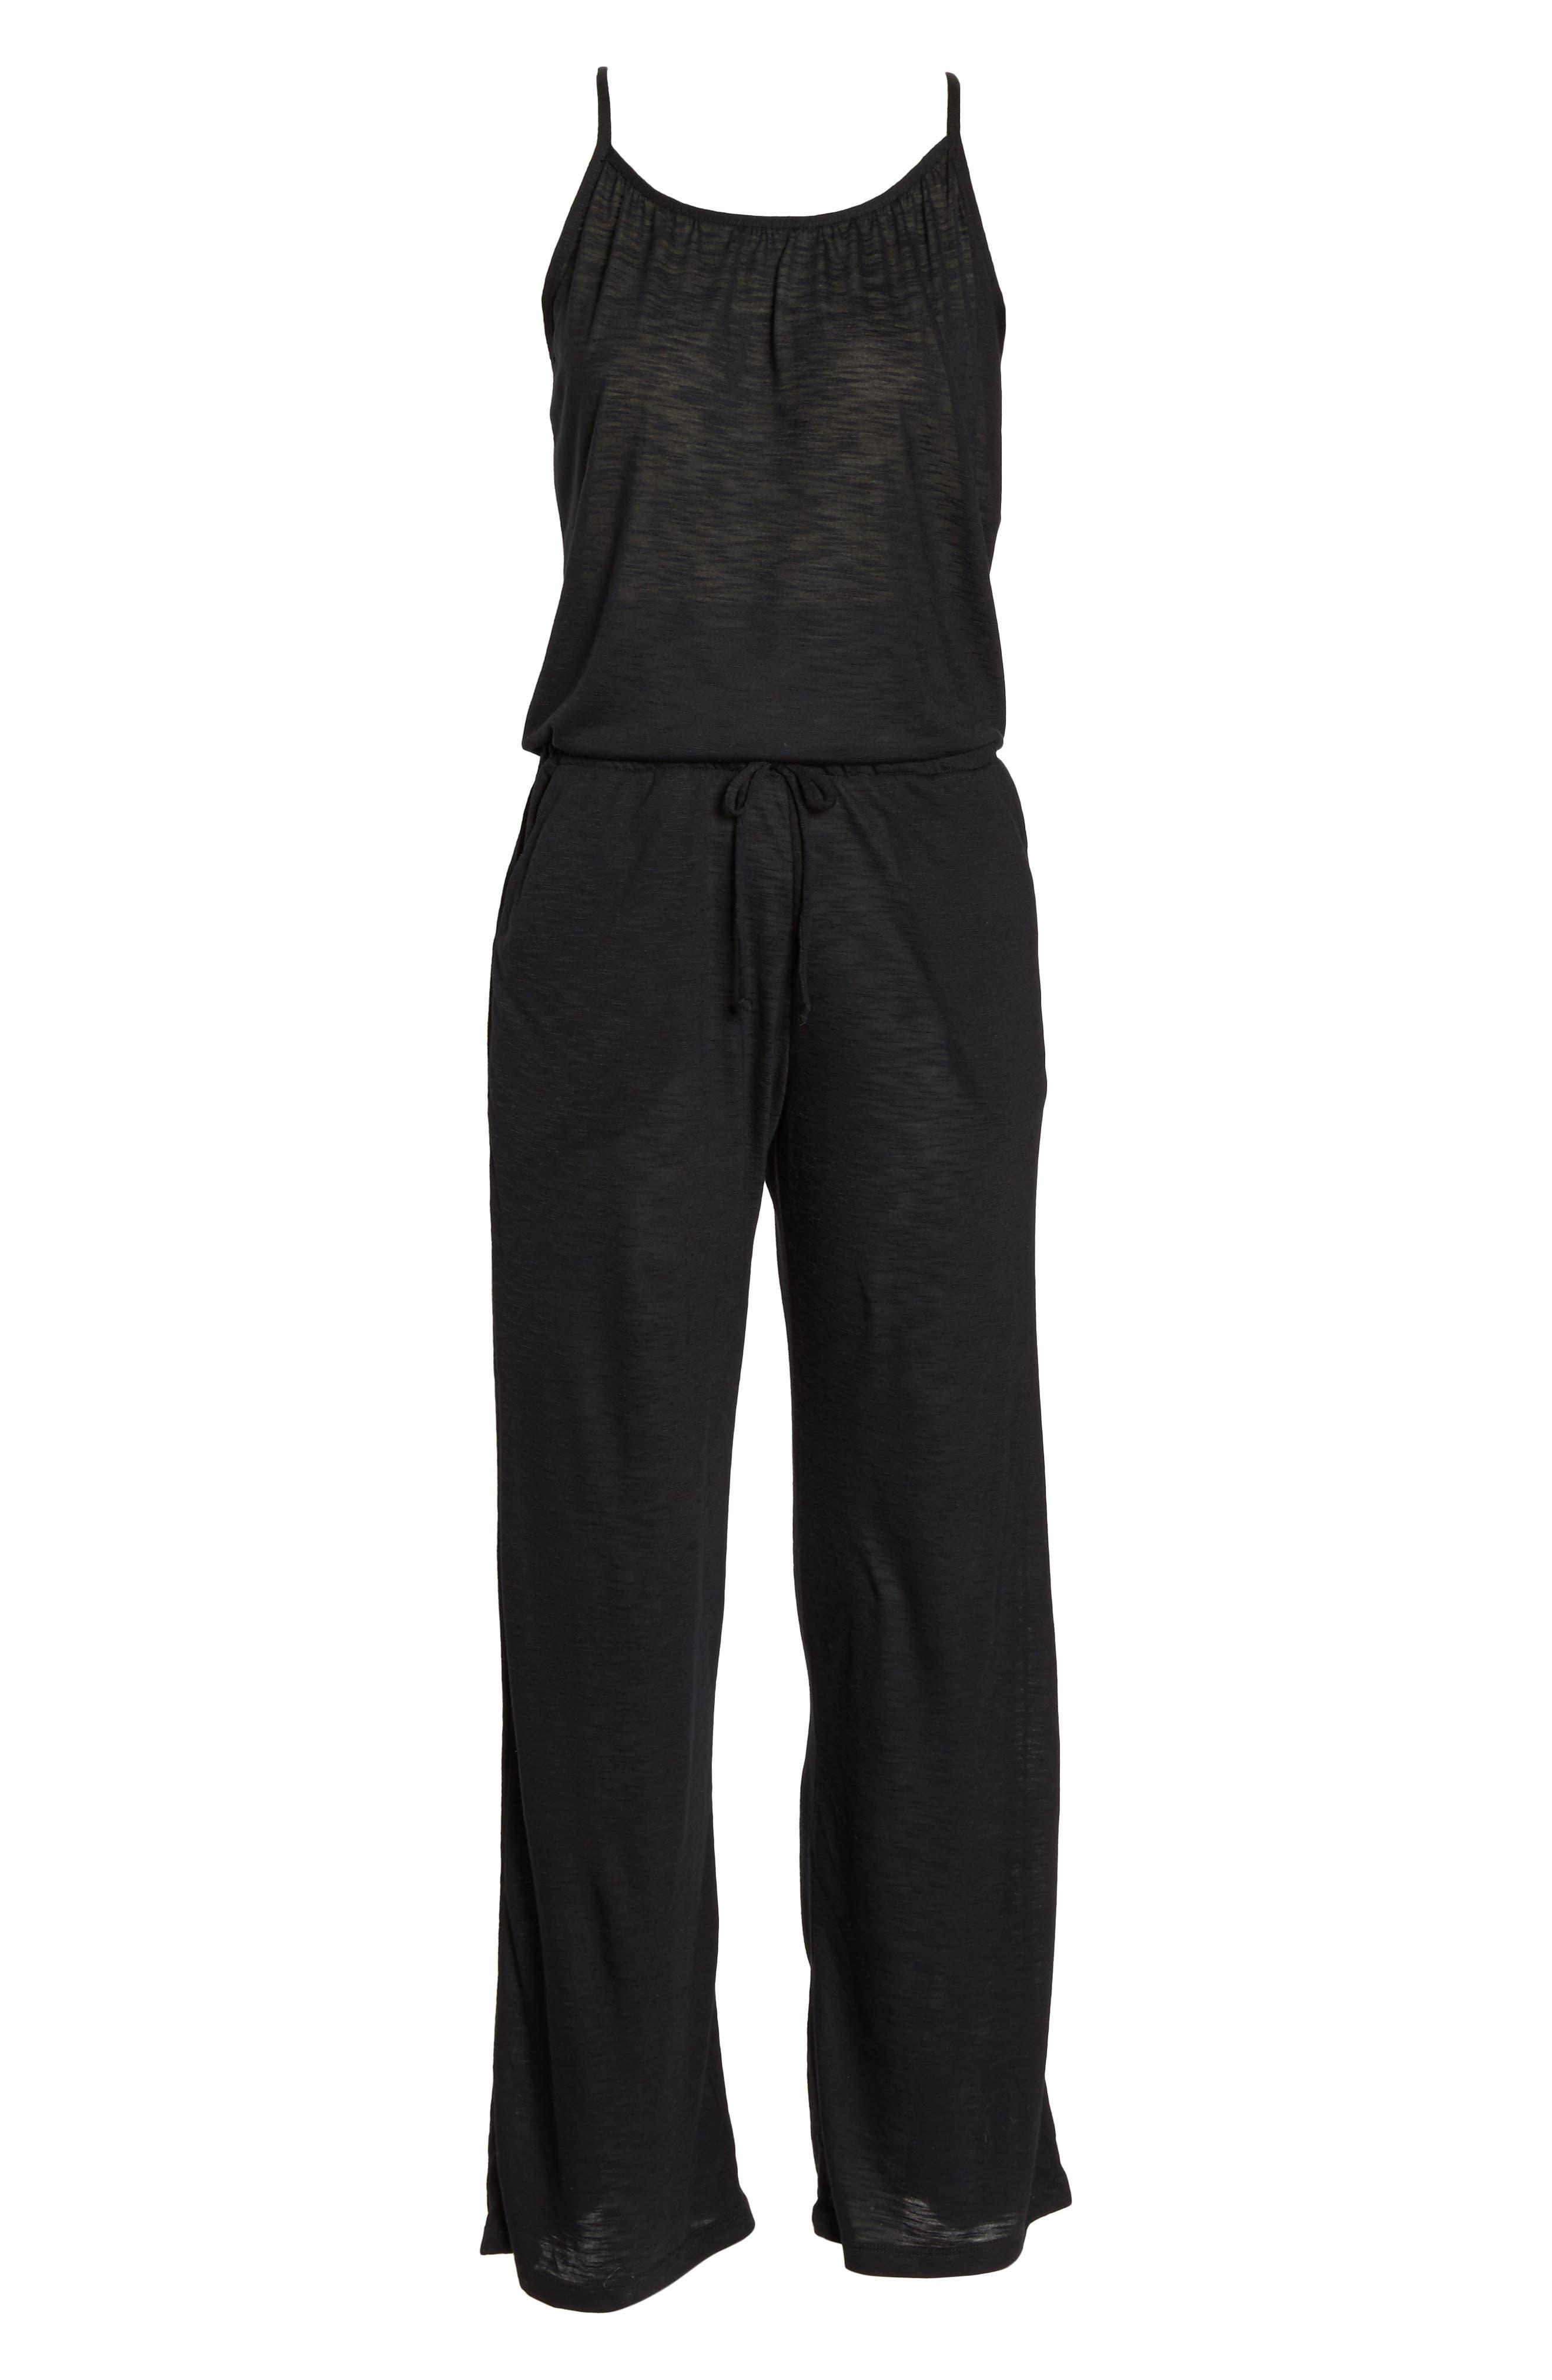 Breezy Basics Jumpsuit,                             Alternate thumbnail 6, color,                             BLACK